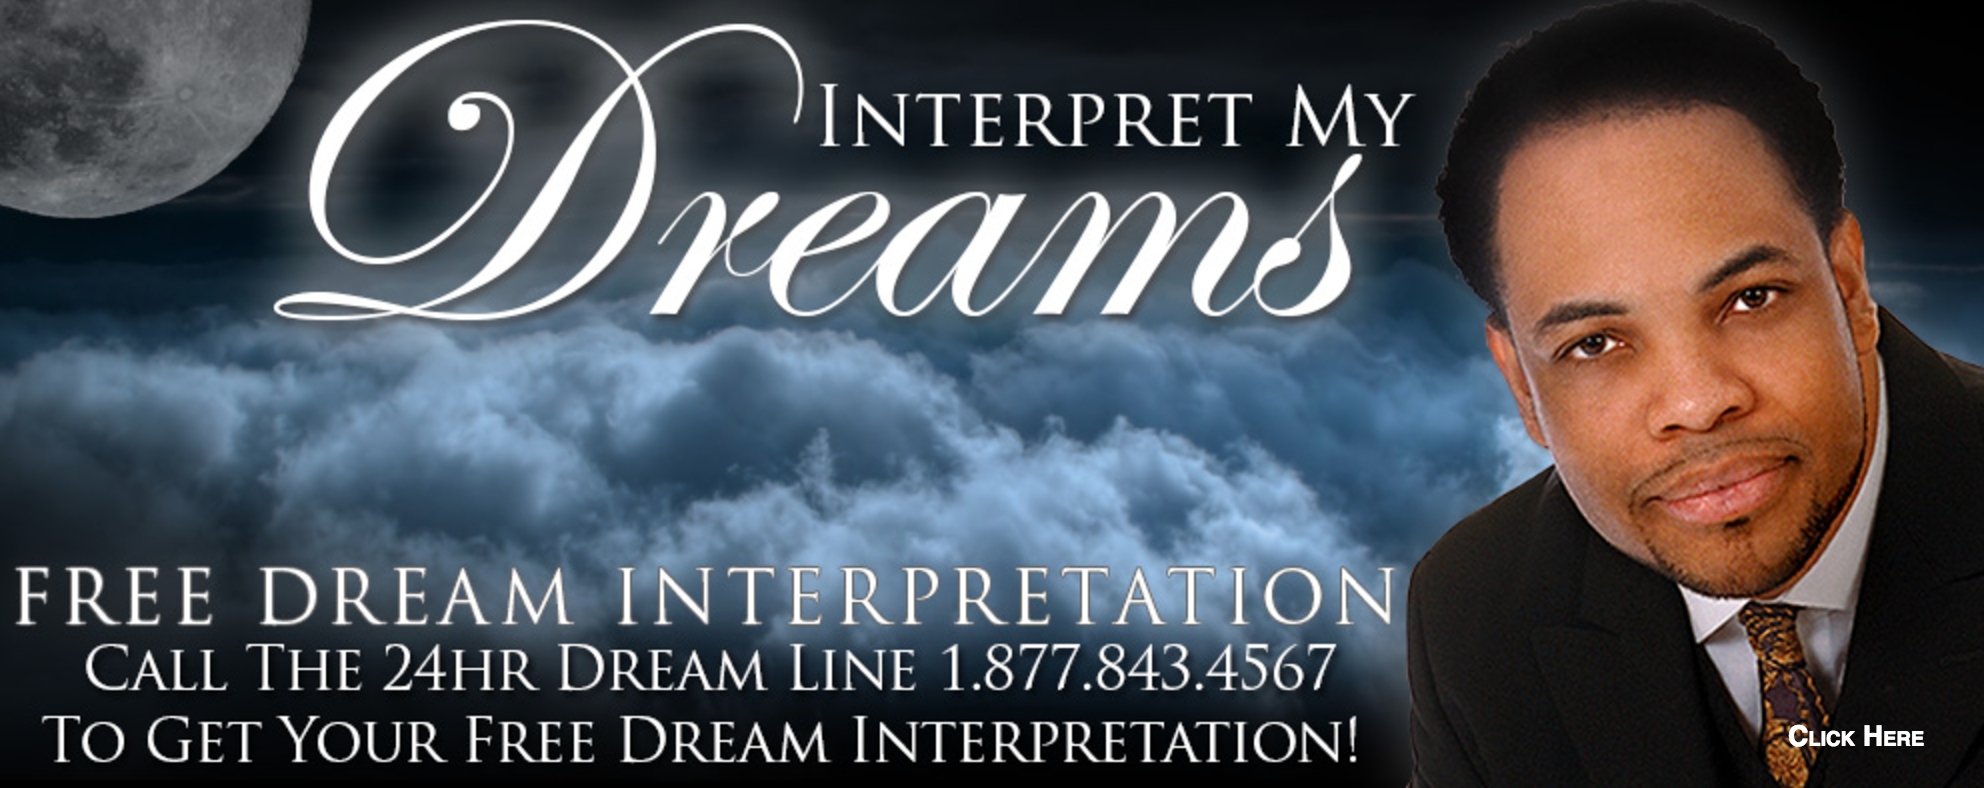 Free Biblical Dream Interpretation | Apostle David E  Taylor